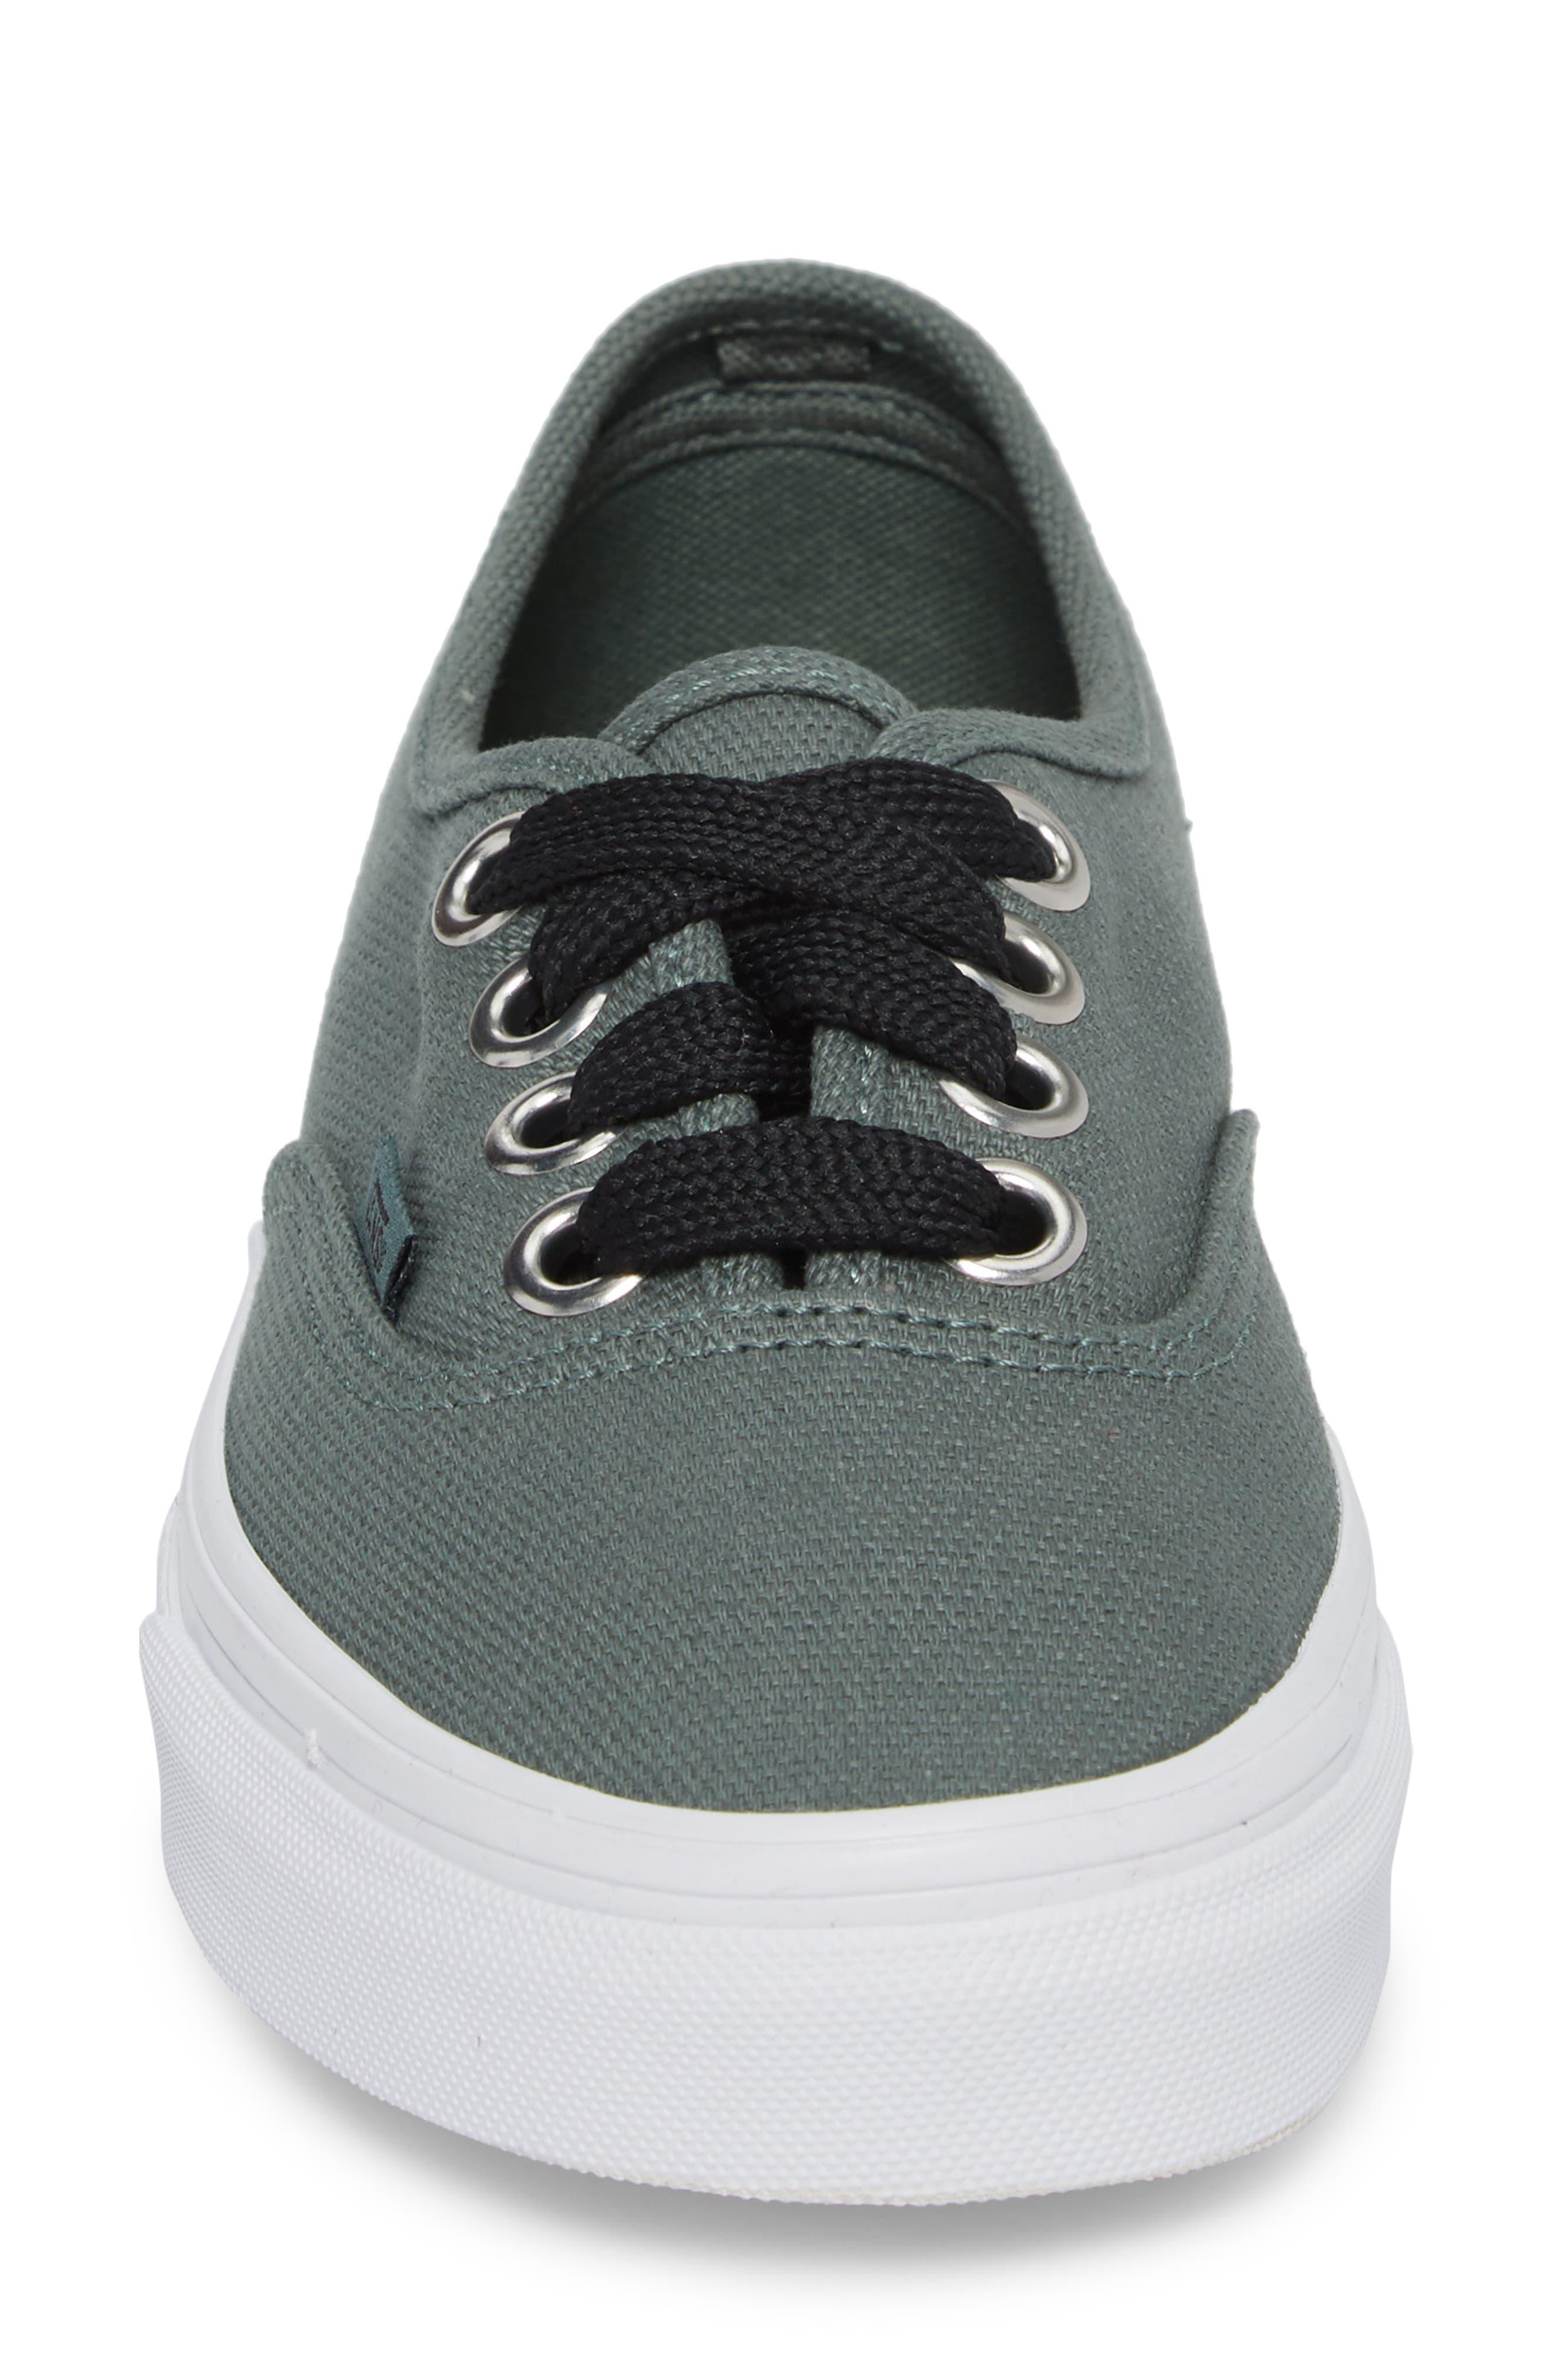 ,                             'Authentic' Sneaker,                             Alternate thumbnail 265, color,                             304